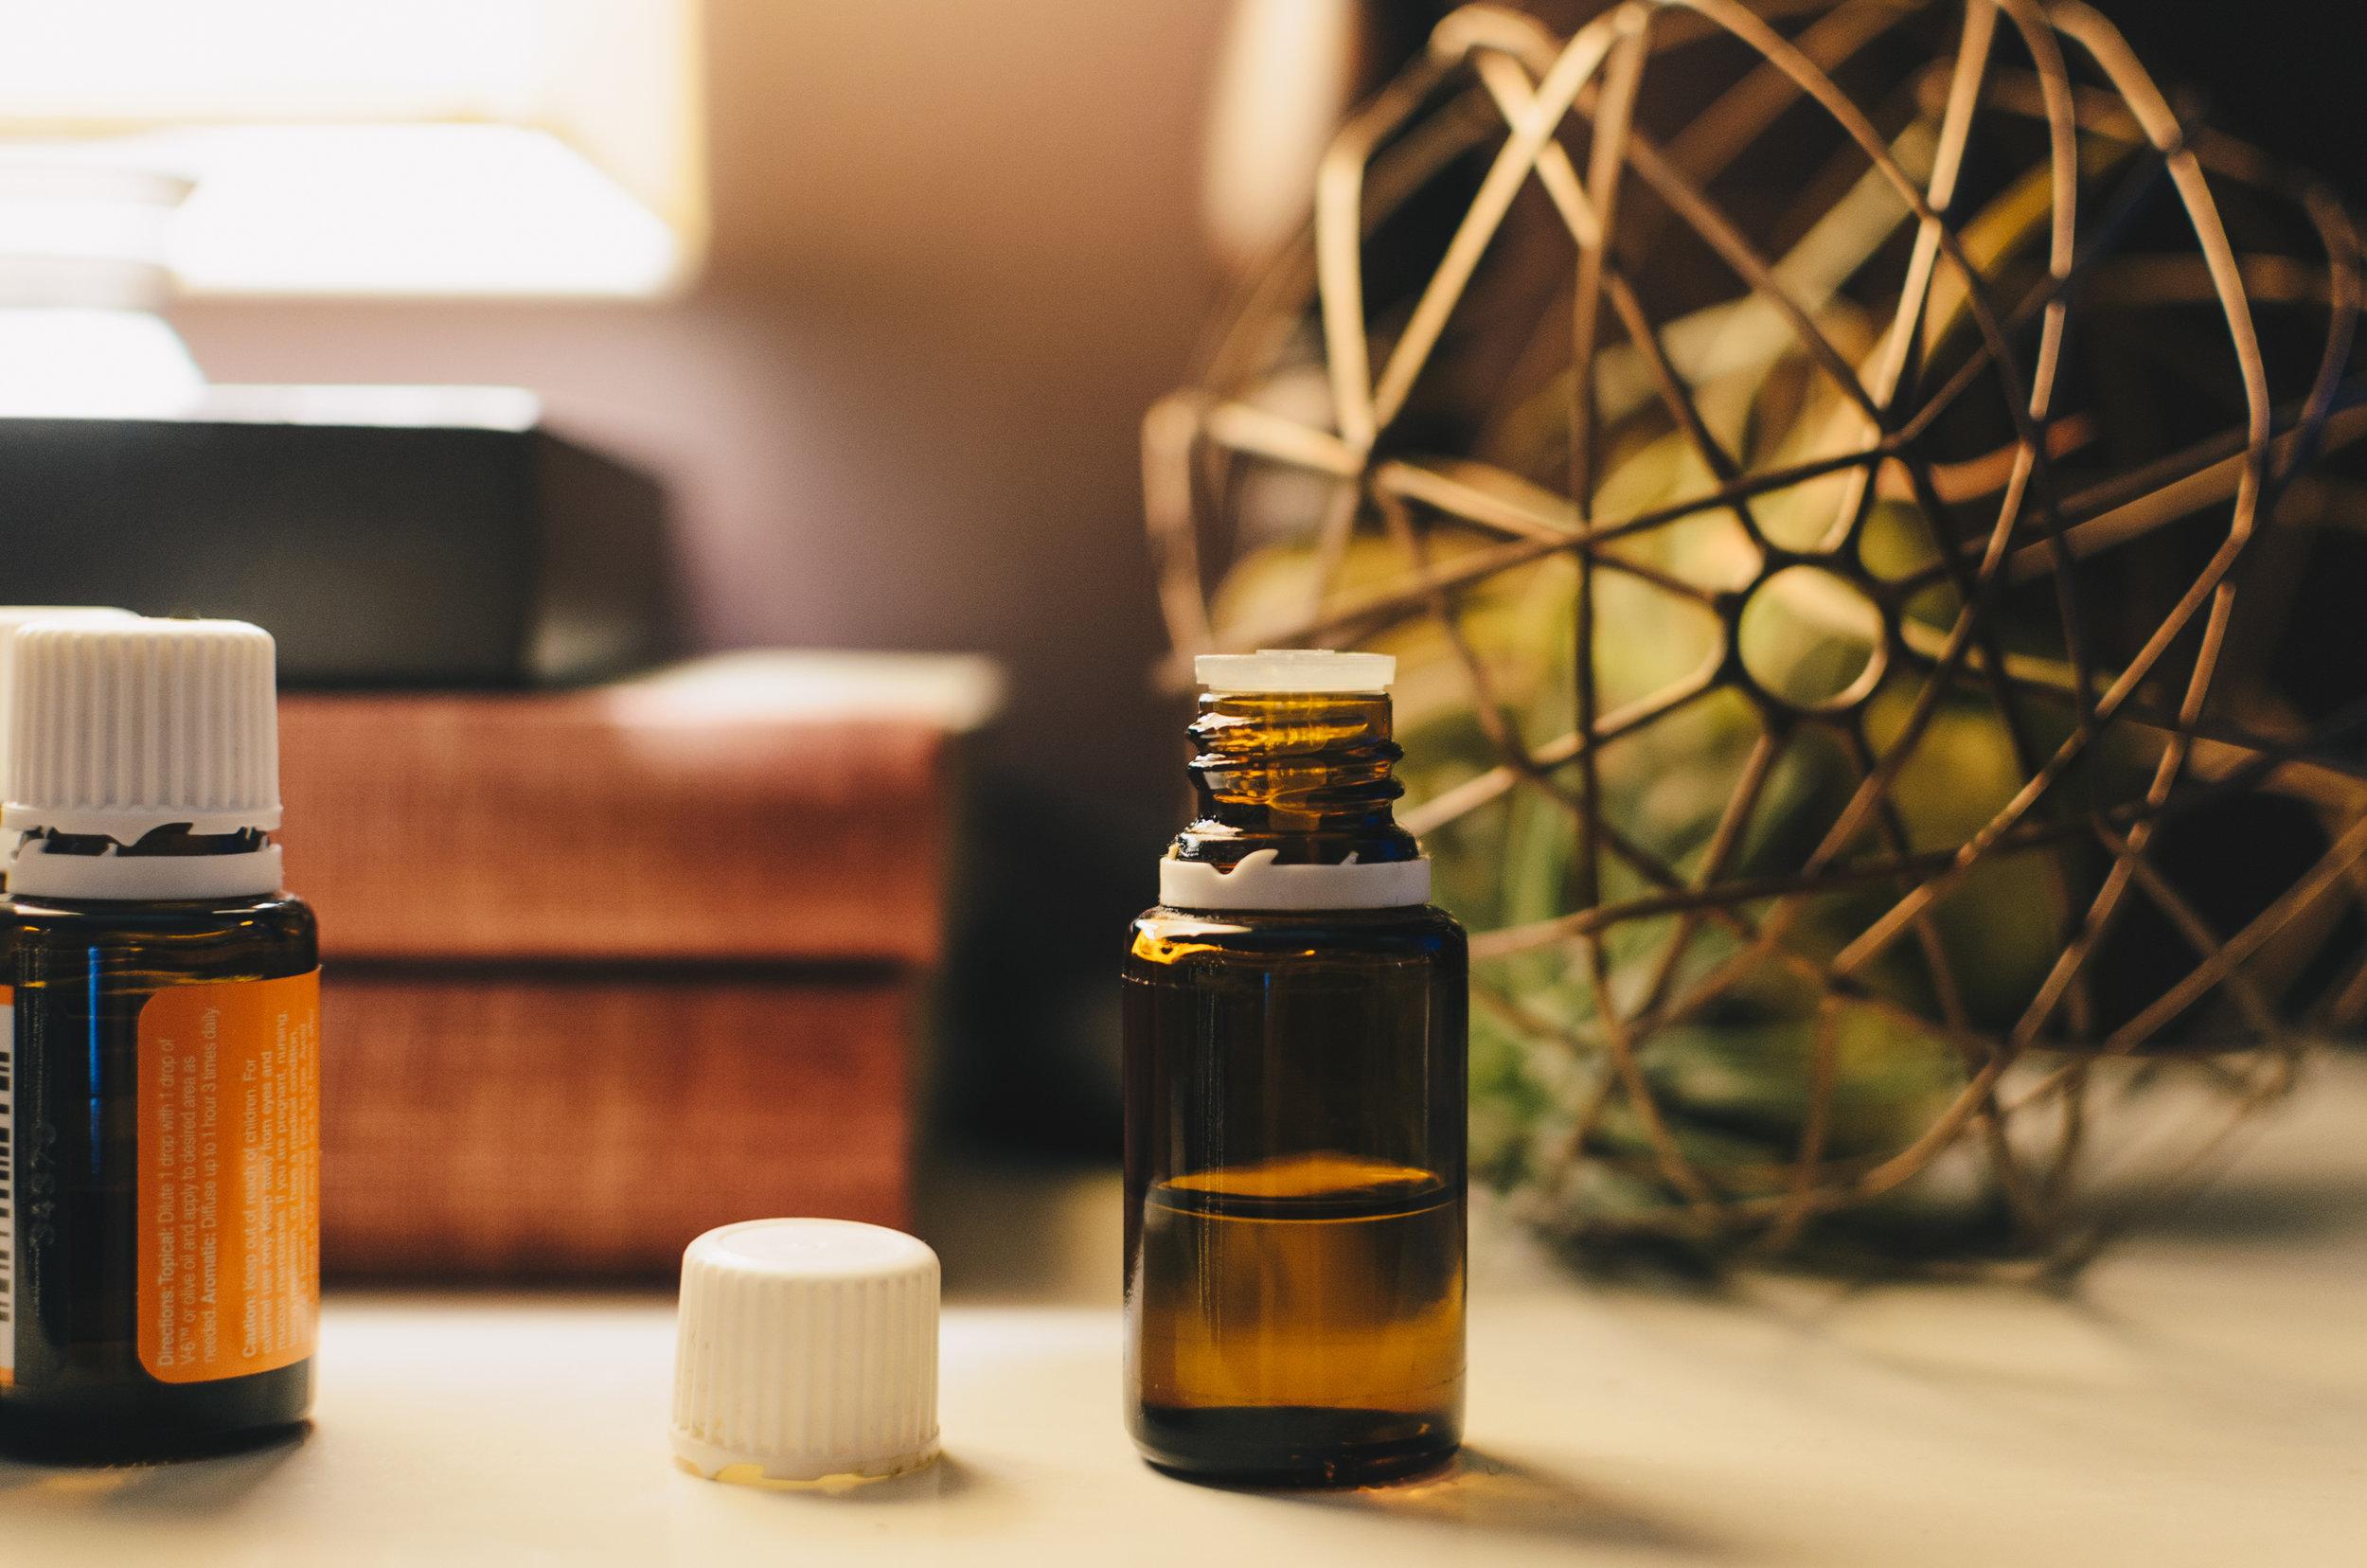 hemp oils by q sciences.JPG